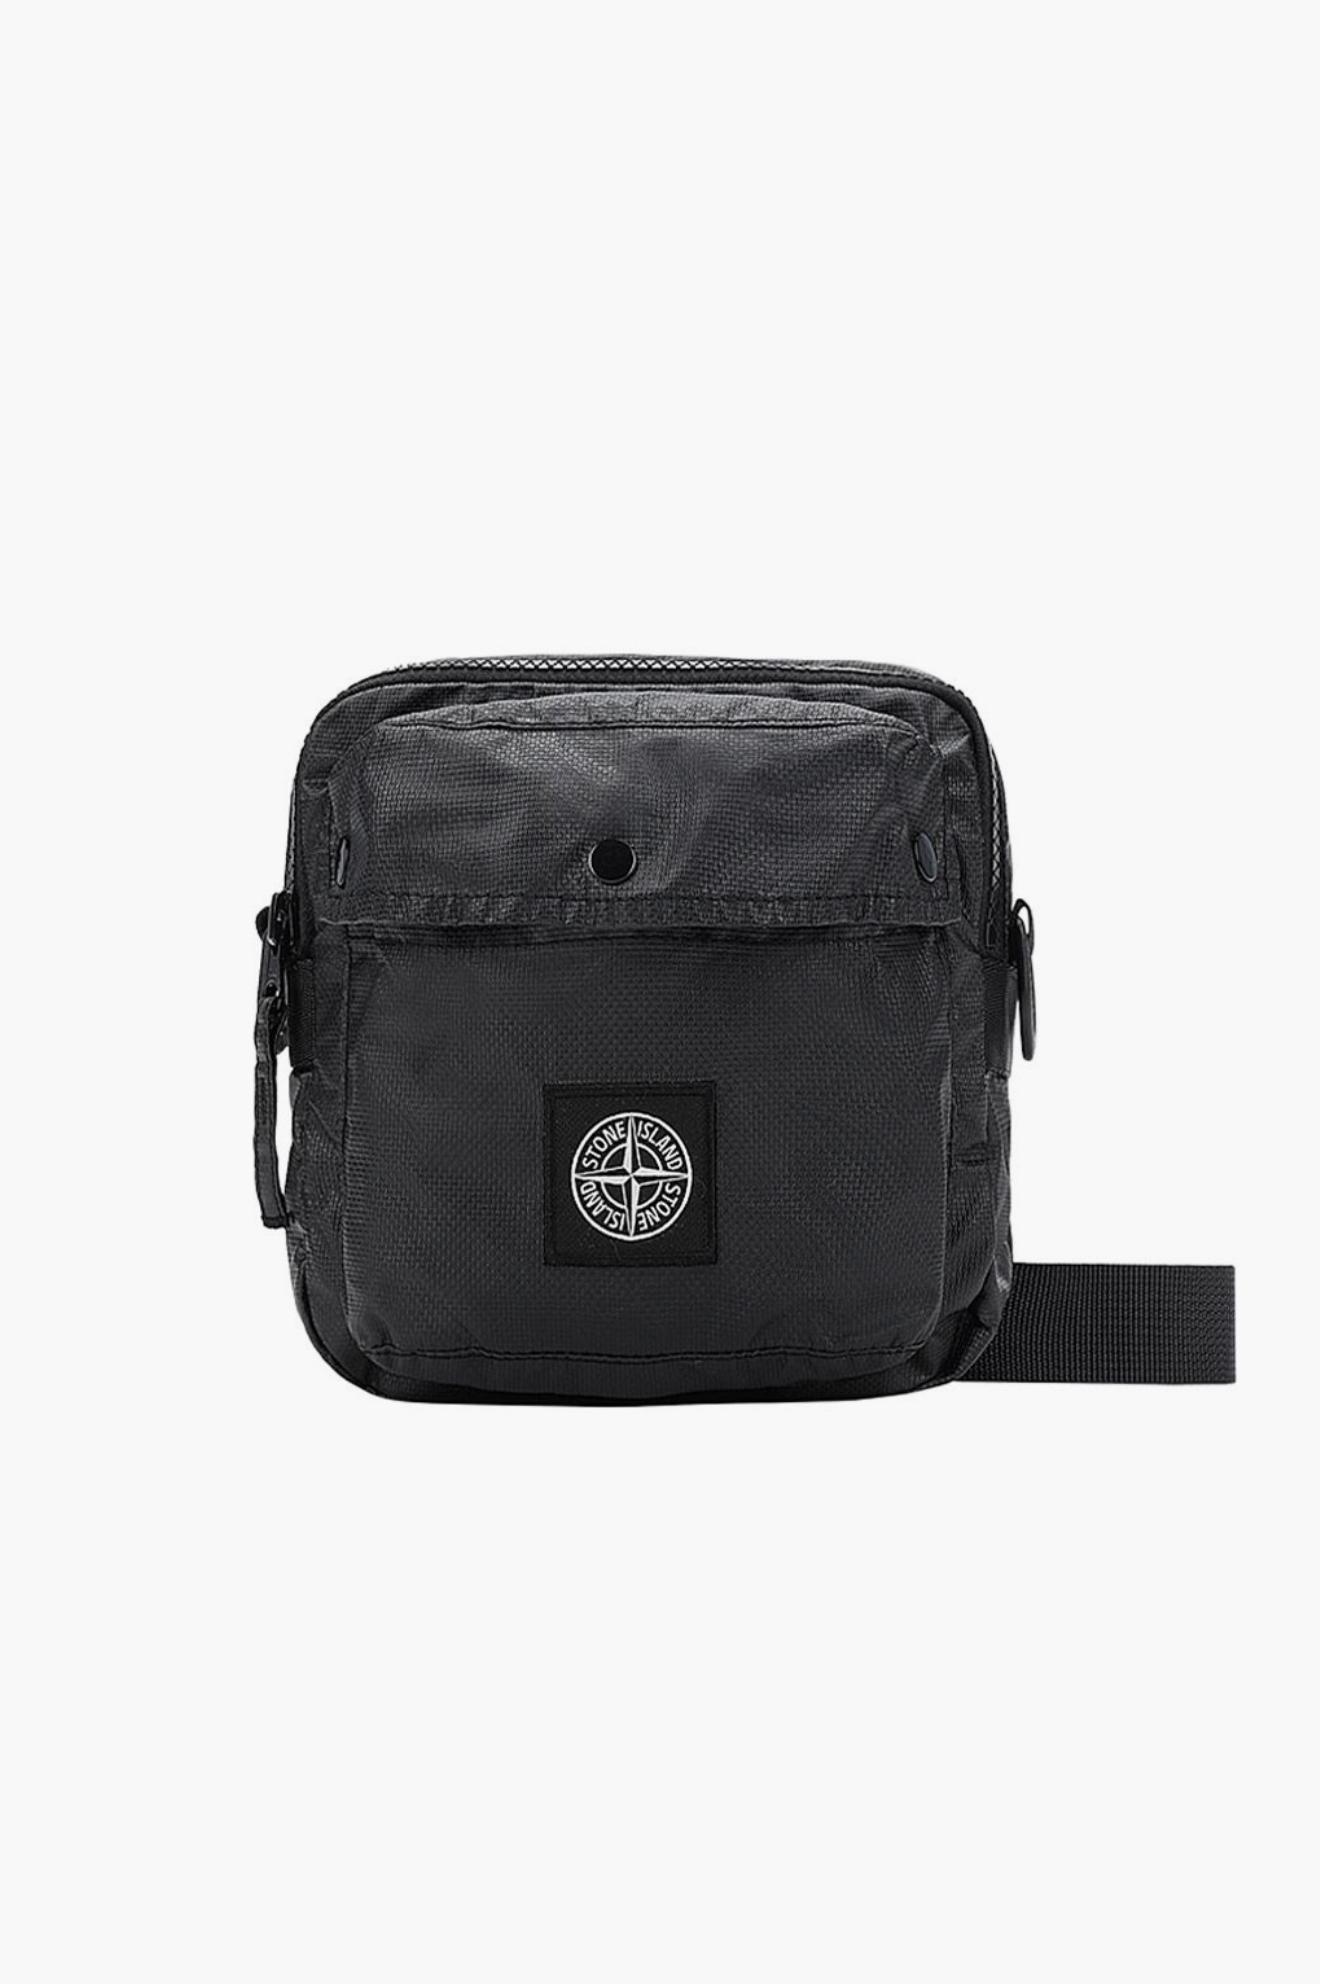 Map Bag Black